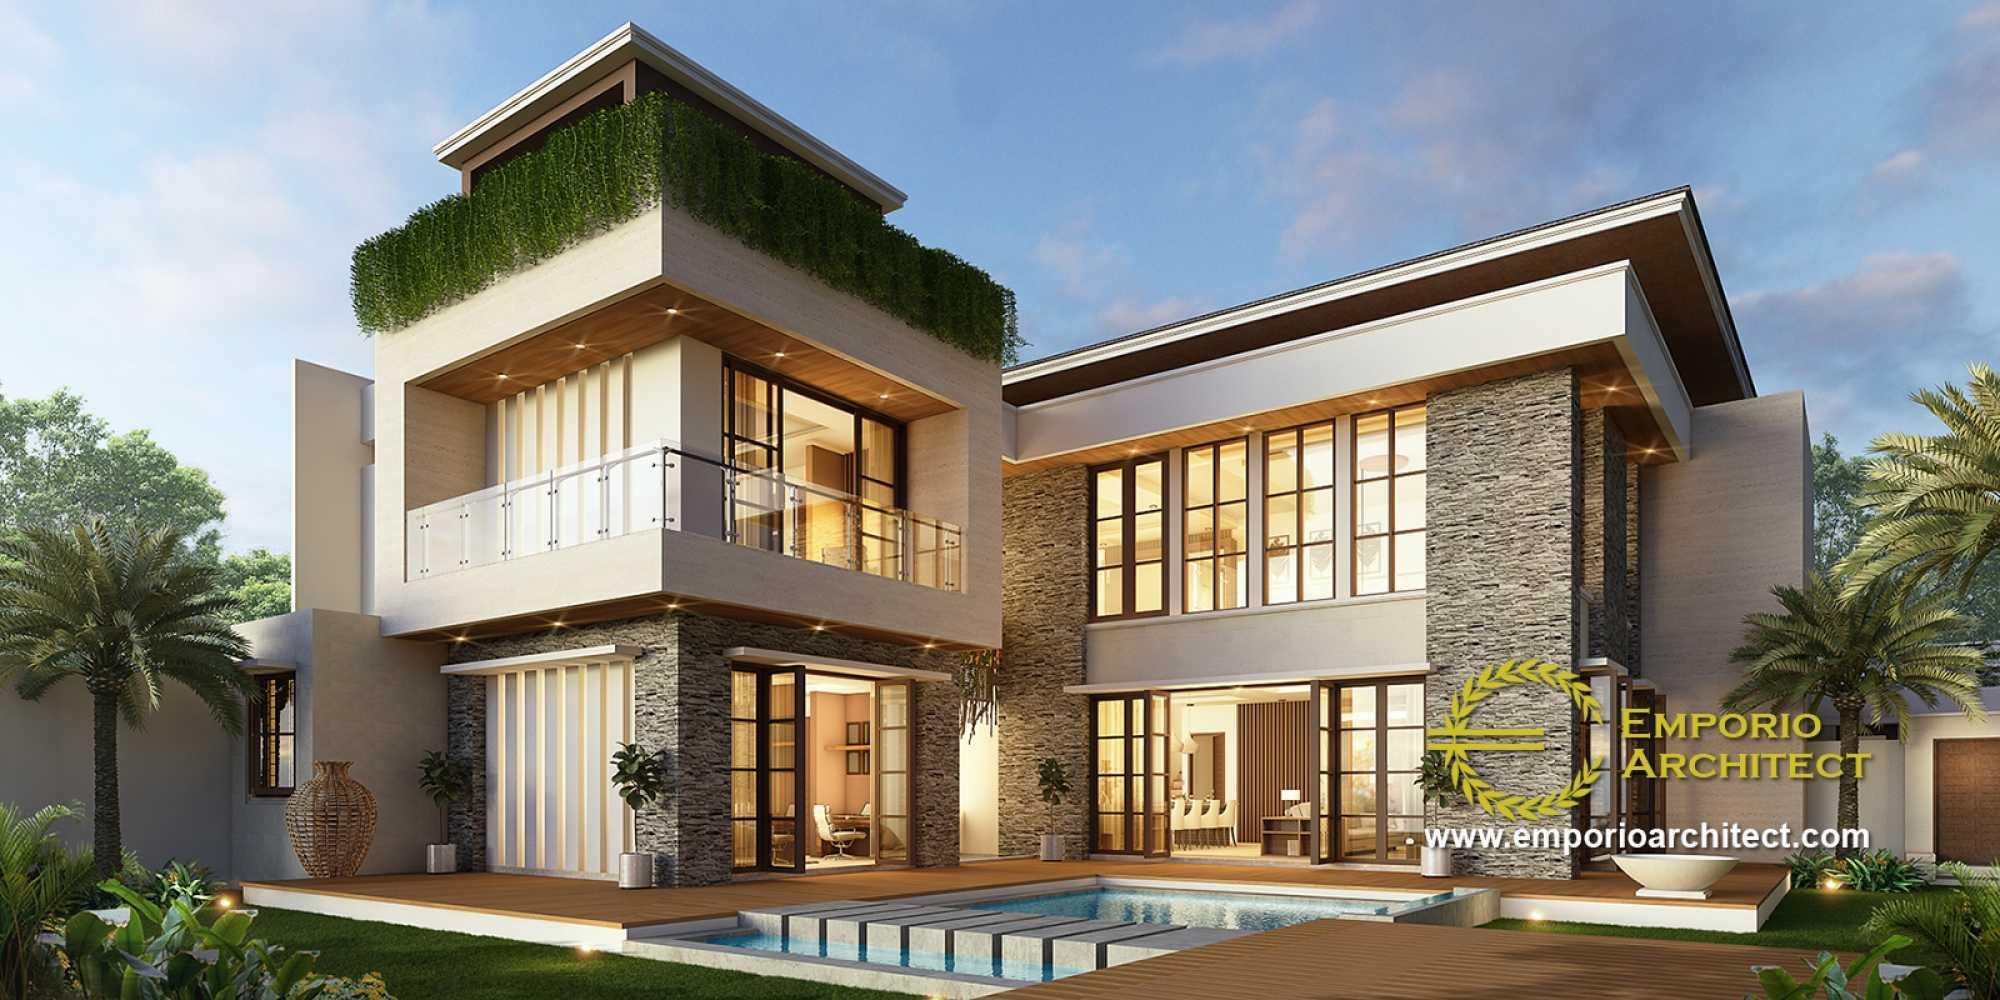 Emporio Architect Desain Rumah Modern Tropis 339  @ Lombok Pulau Lombok, Nusa Tenggara Bar., Indonesia Pulau Lombok, Nusa Tenggara Bar., Indonesia Emporio-Architect-Desain-Rumah-Modern-Tropis-339-Lombok  73344